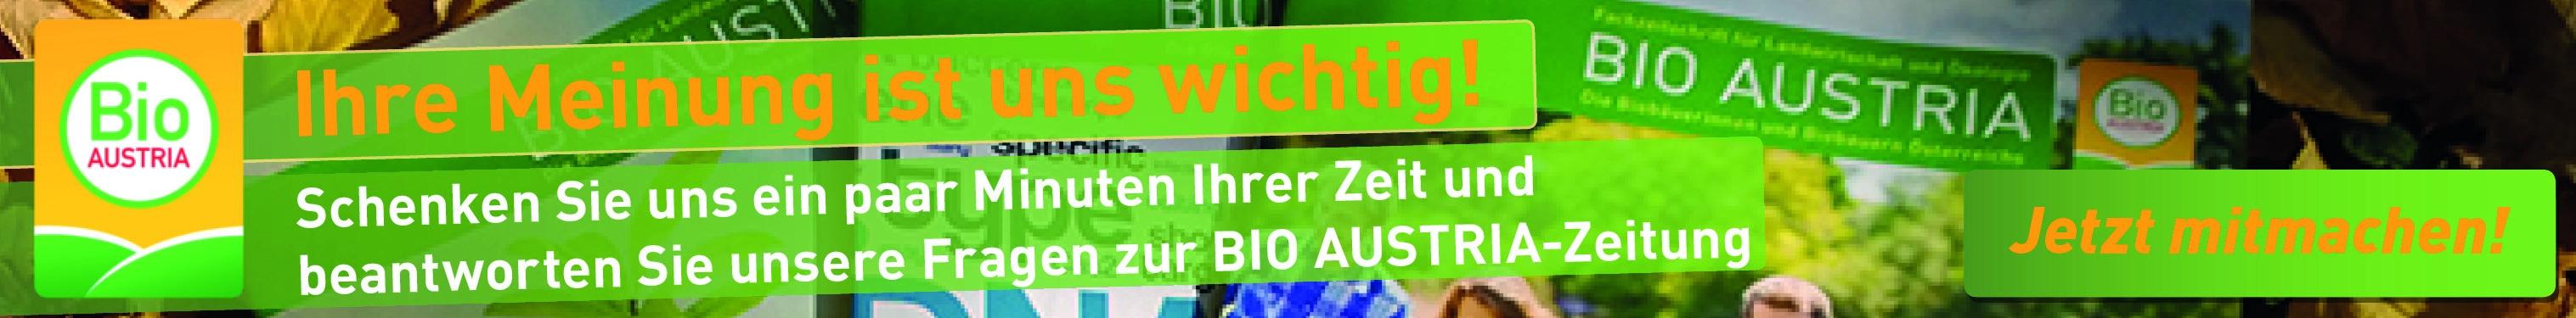 Leserbefragung BIO AUSTRIA